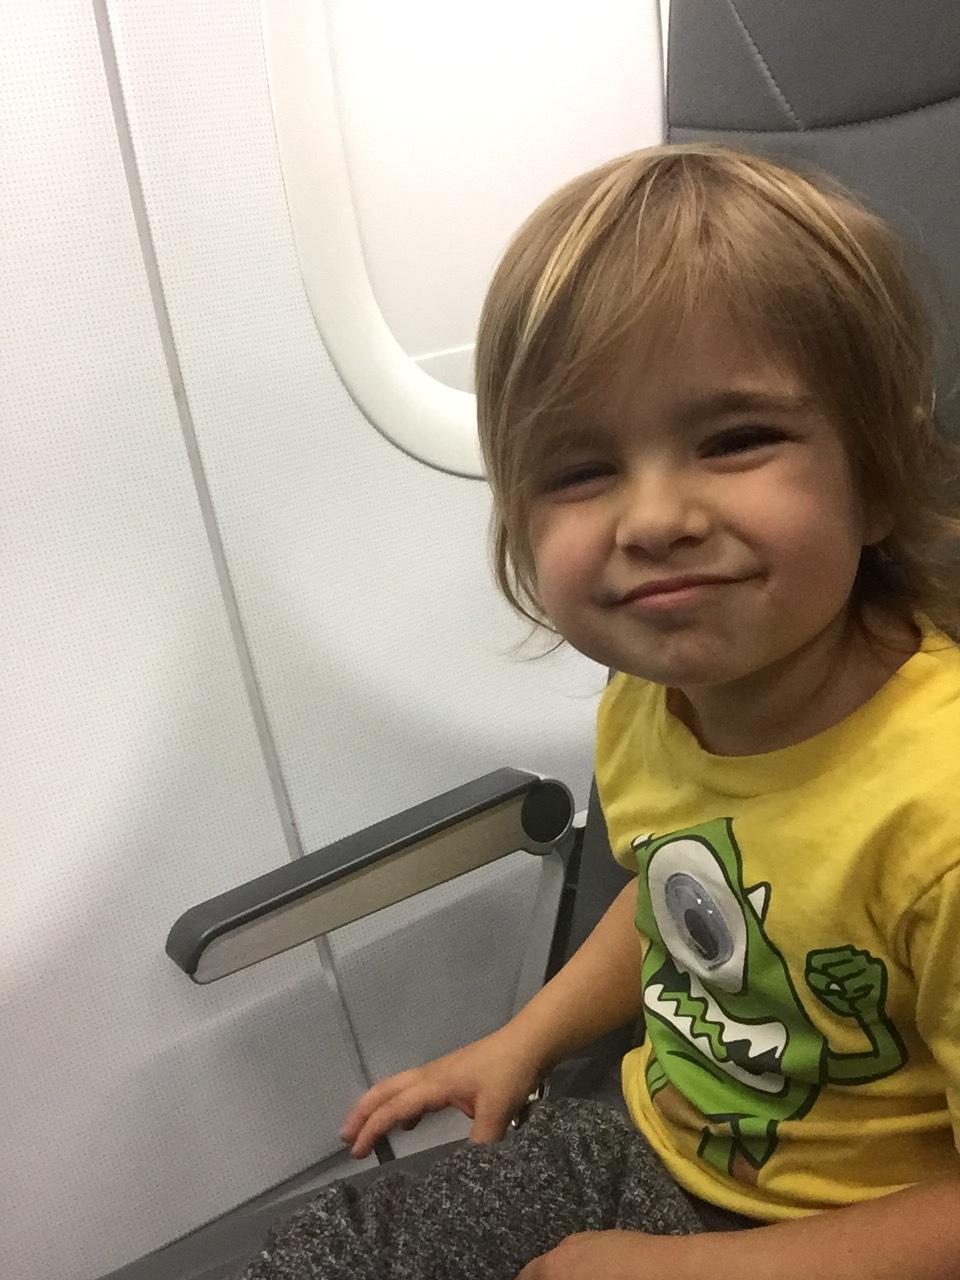 Preschooler_On_Airplane